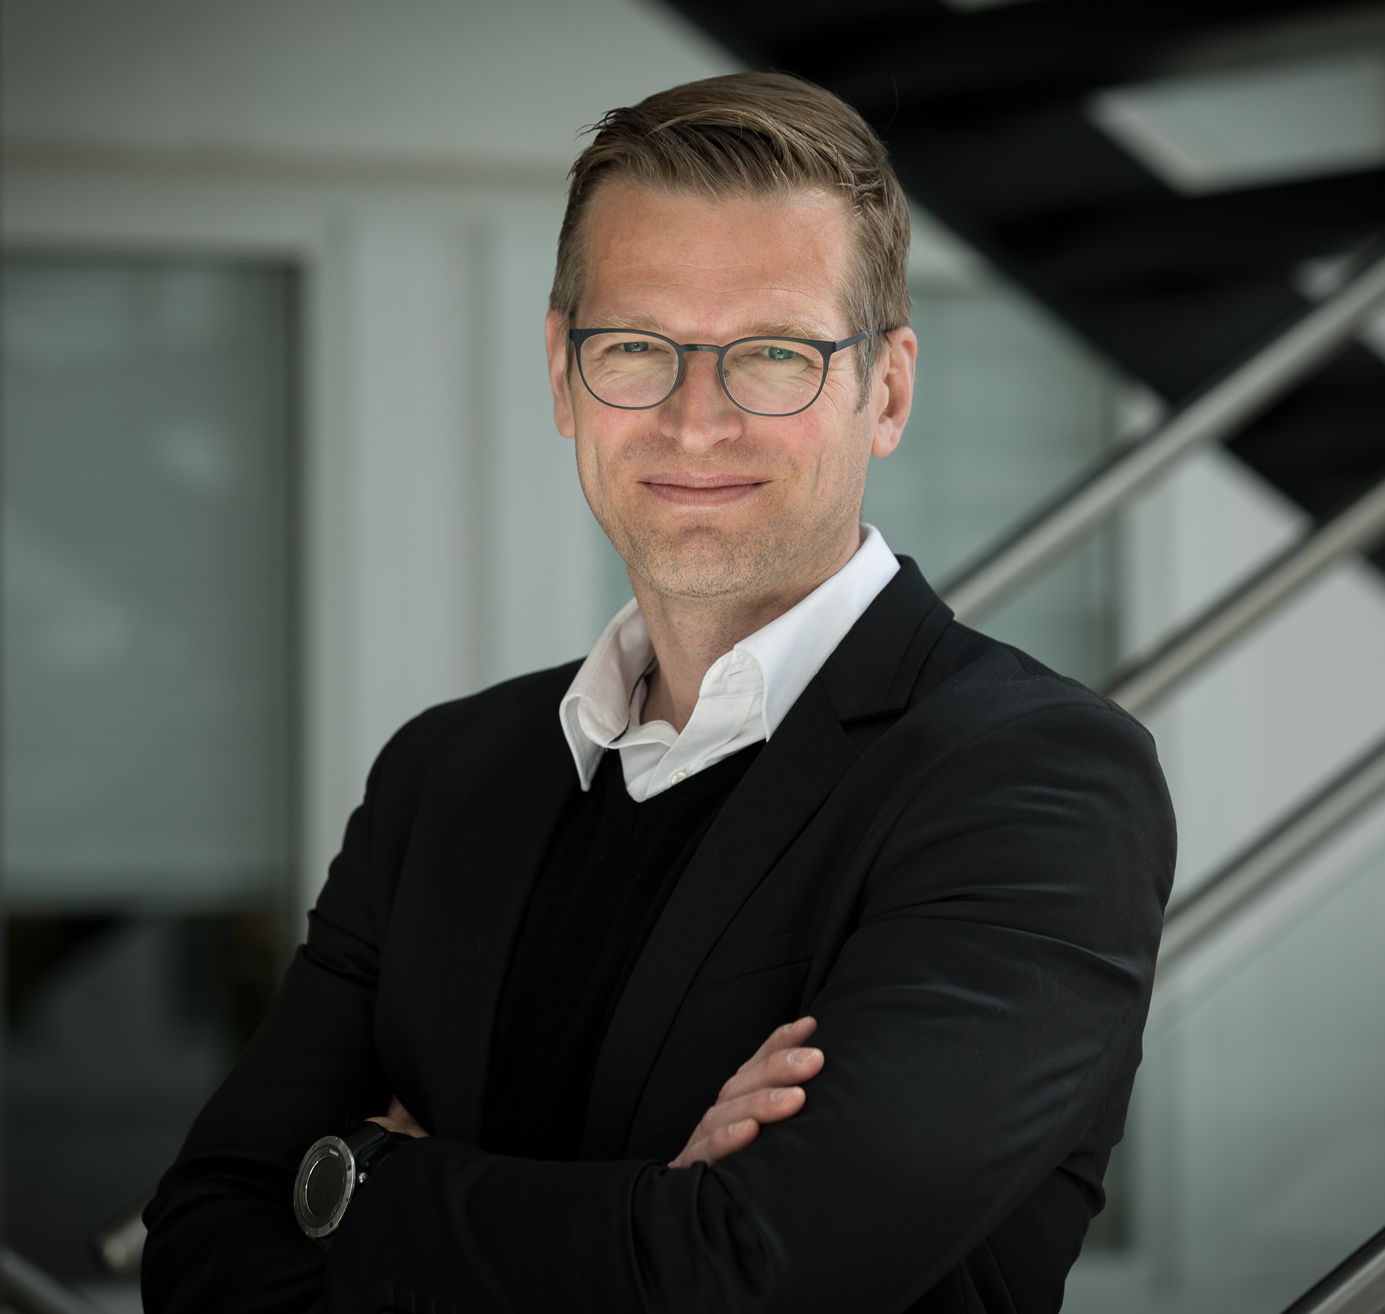 Niklas Sandler